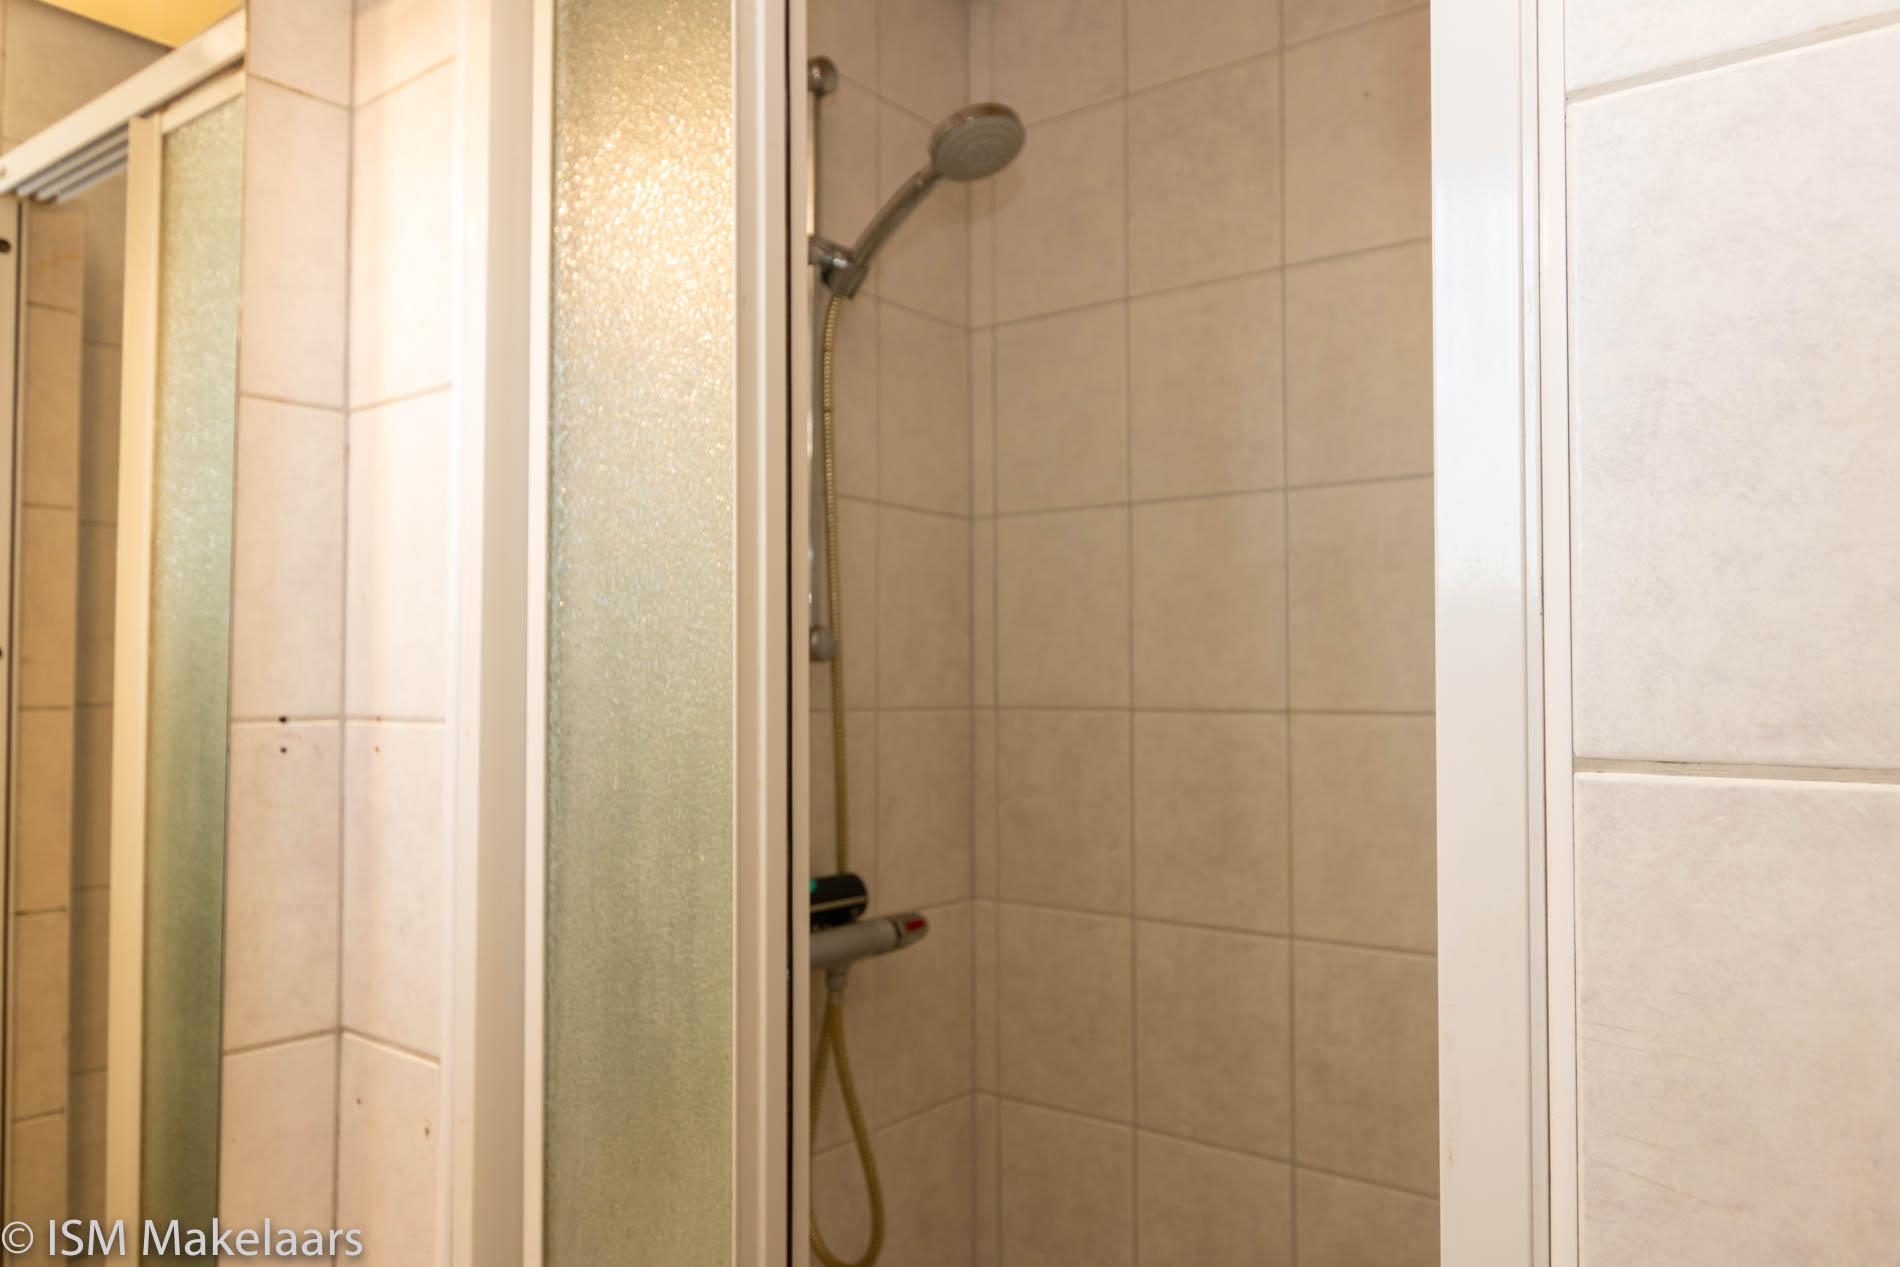 badkamer Paul Krugerstraat 389 vlissingen ism makelaars